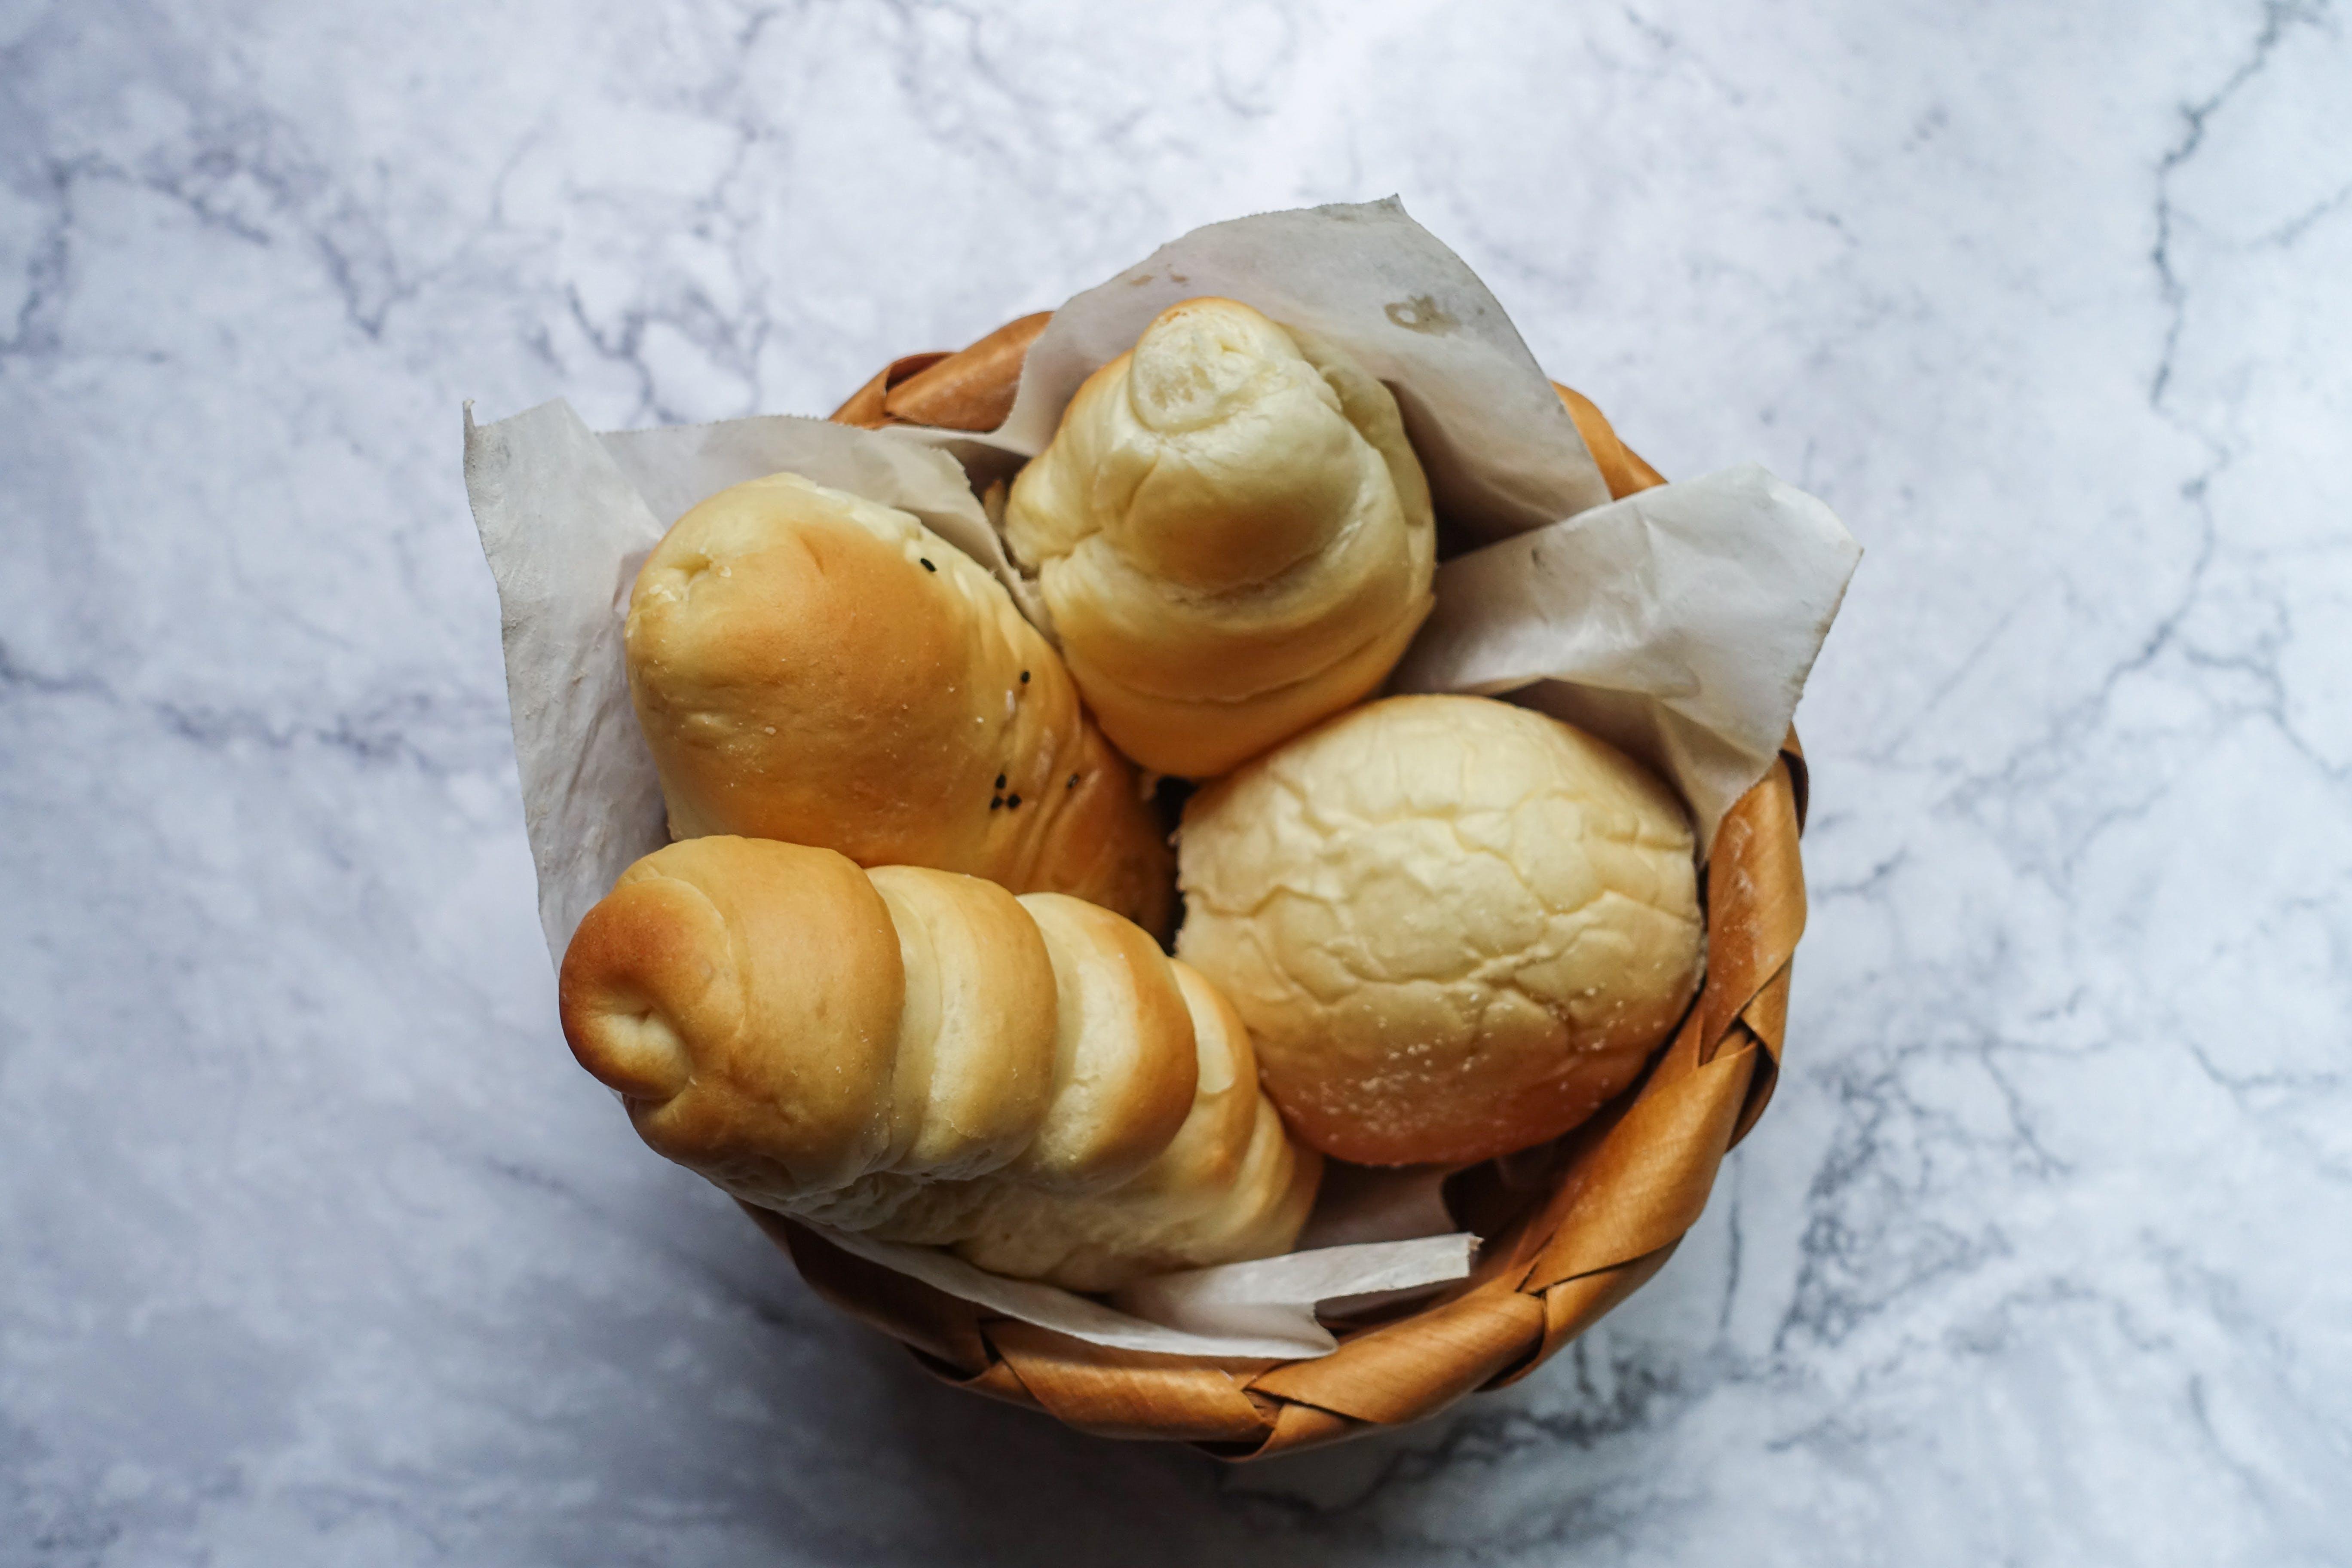 Four Brown Pastries in Brown Wicker Basket